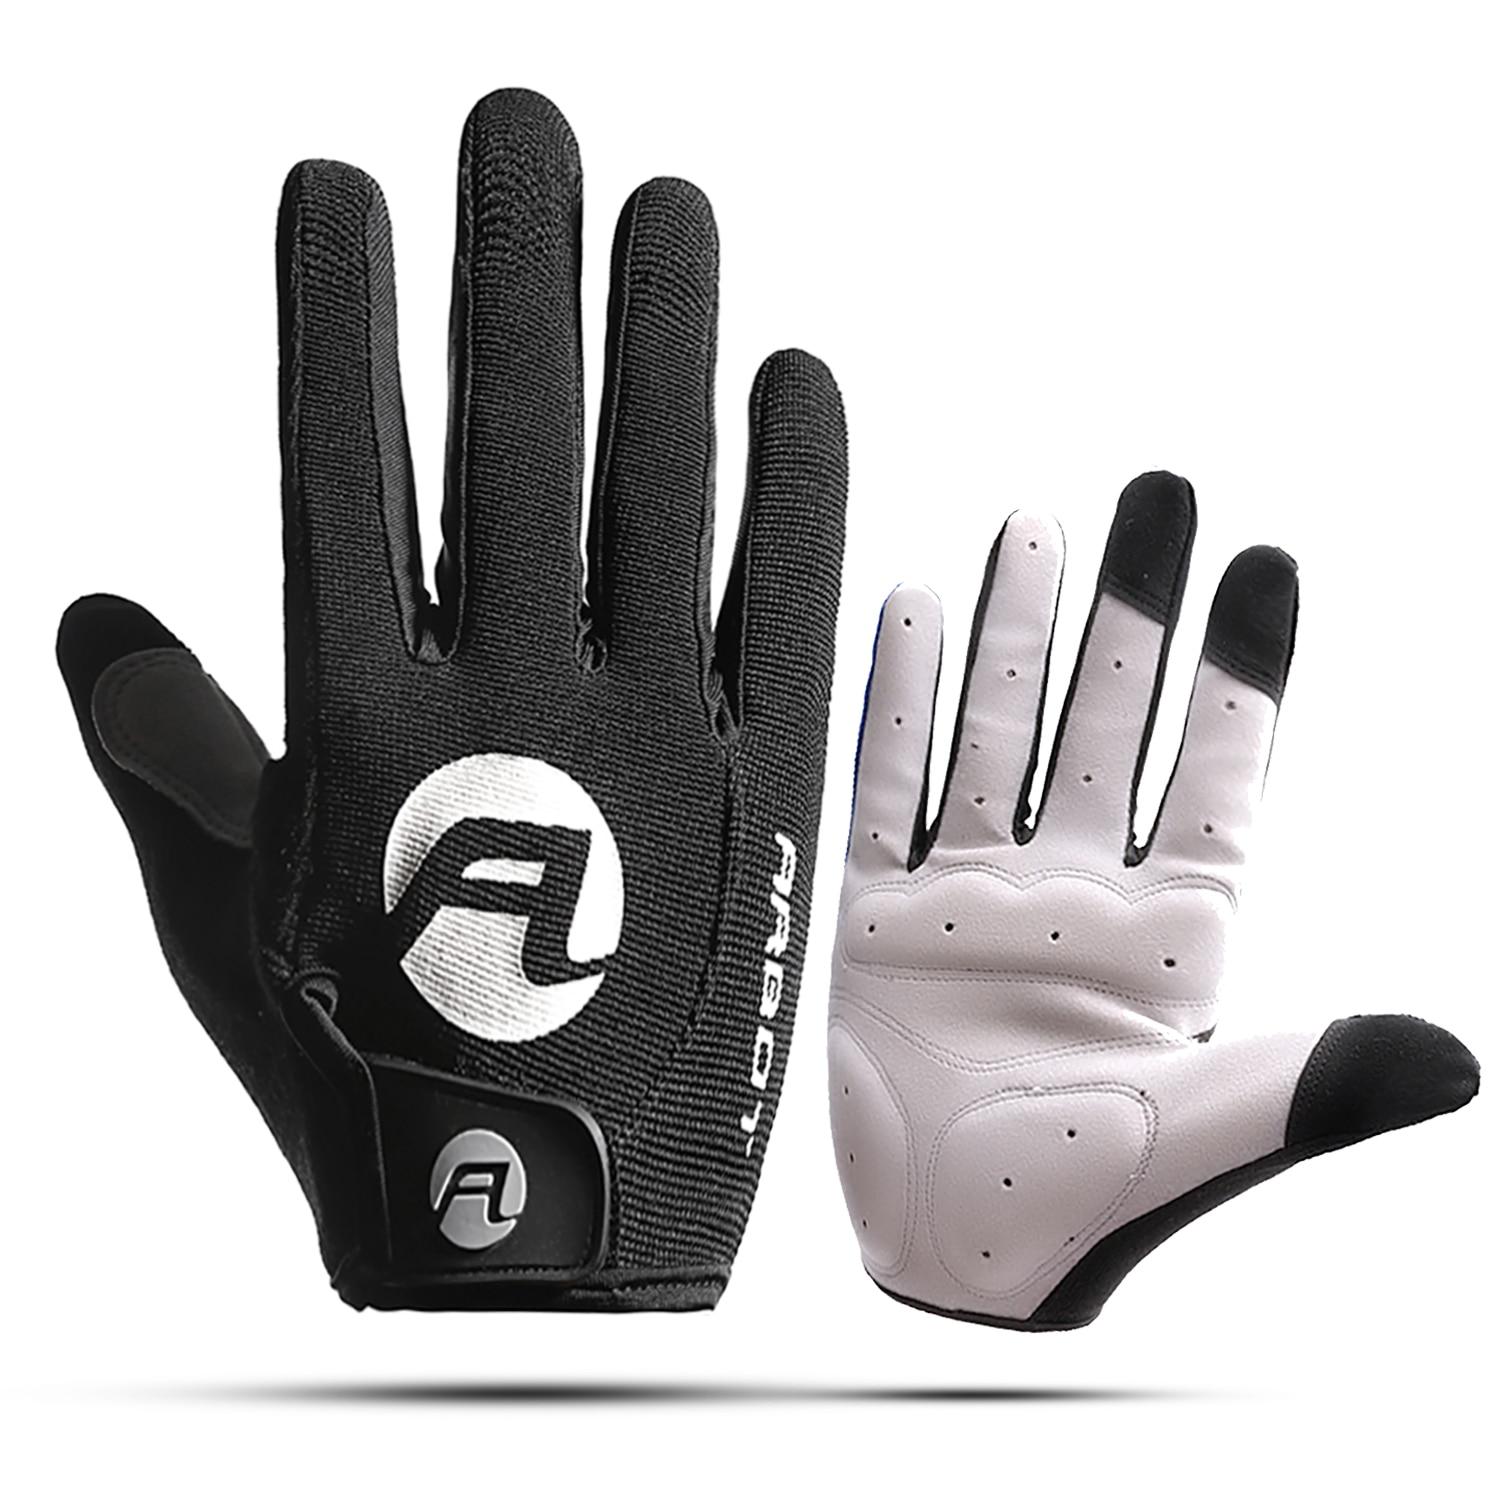 Cycling Anti-slip Full Finger Gloves MTB Bike Gloves Pad Men Breathable Anti-shock Sports Gloves MTB Bike Bicycle Warm Glove Man